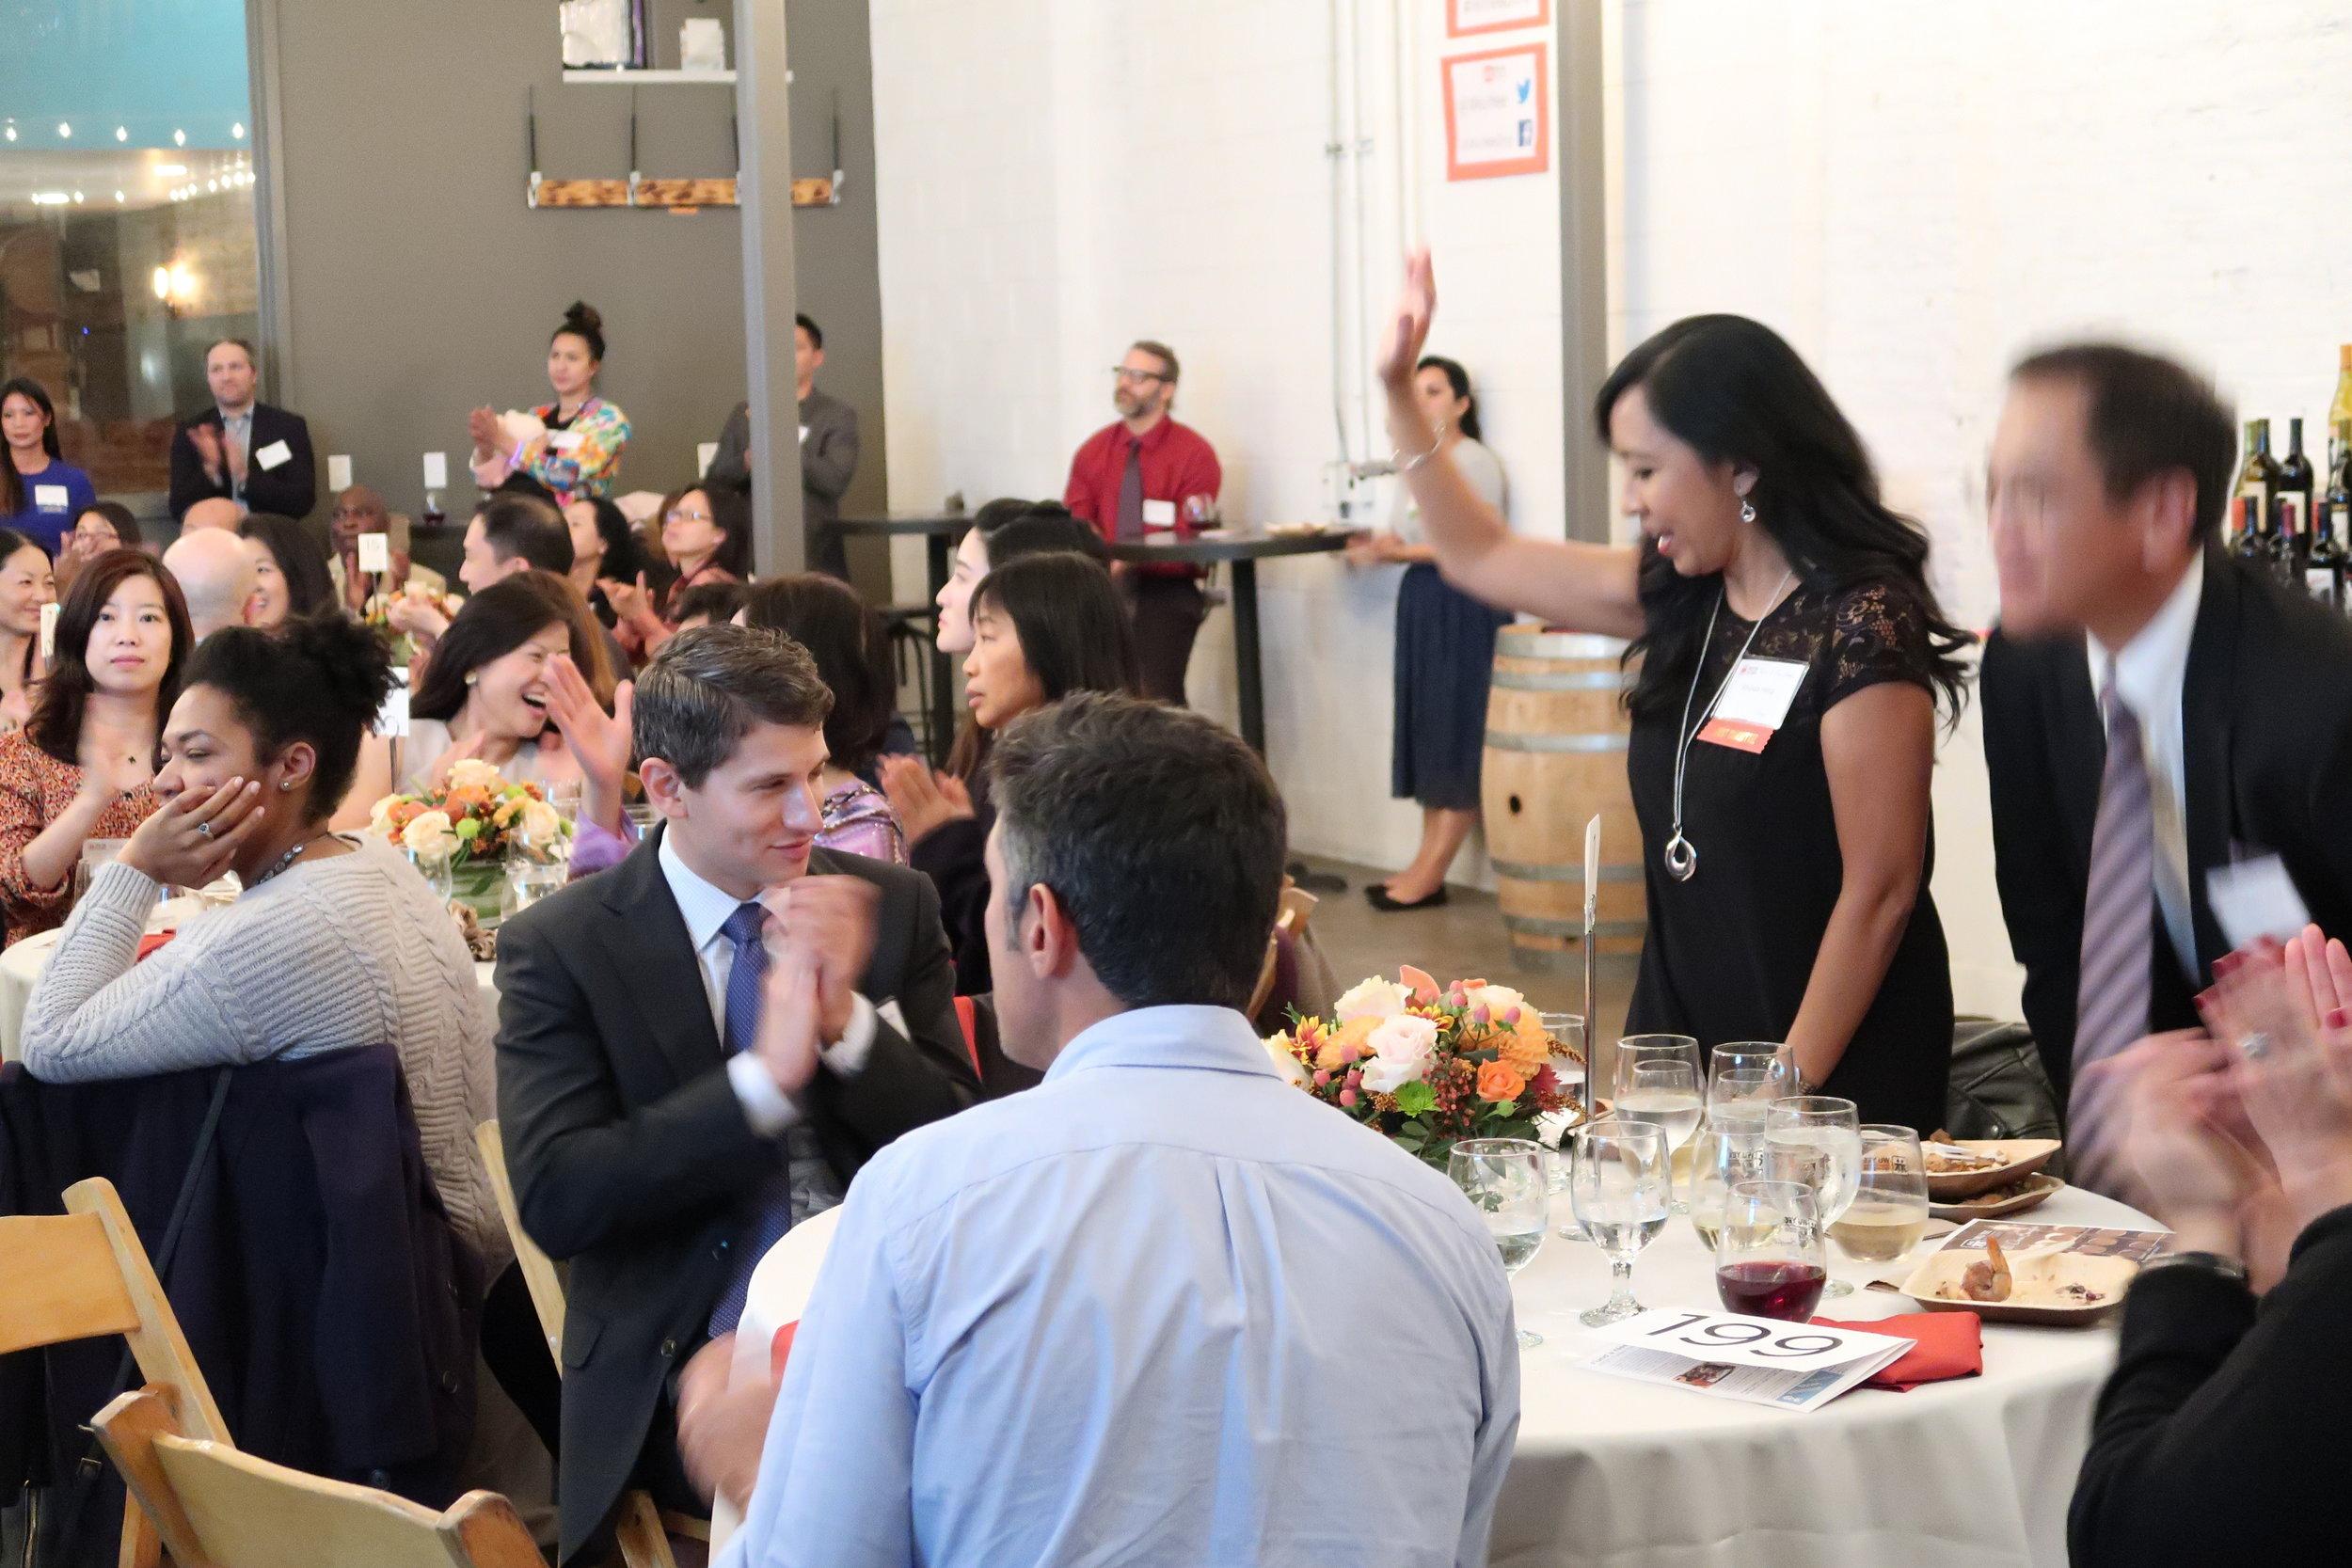 2018.10.17 Wine & Dine Benefit 102.JPG